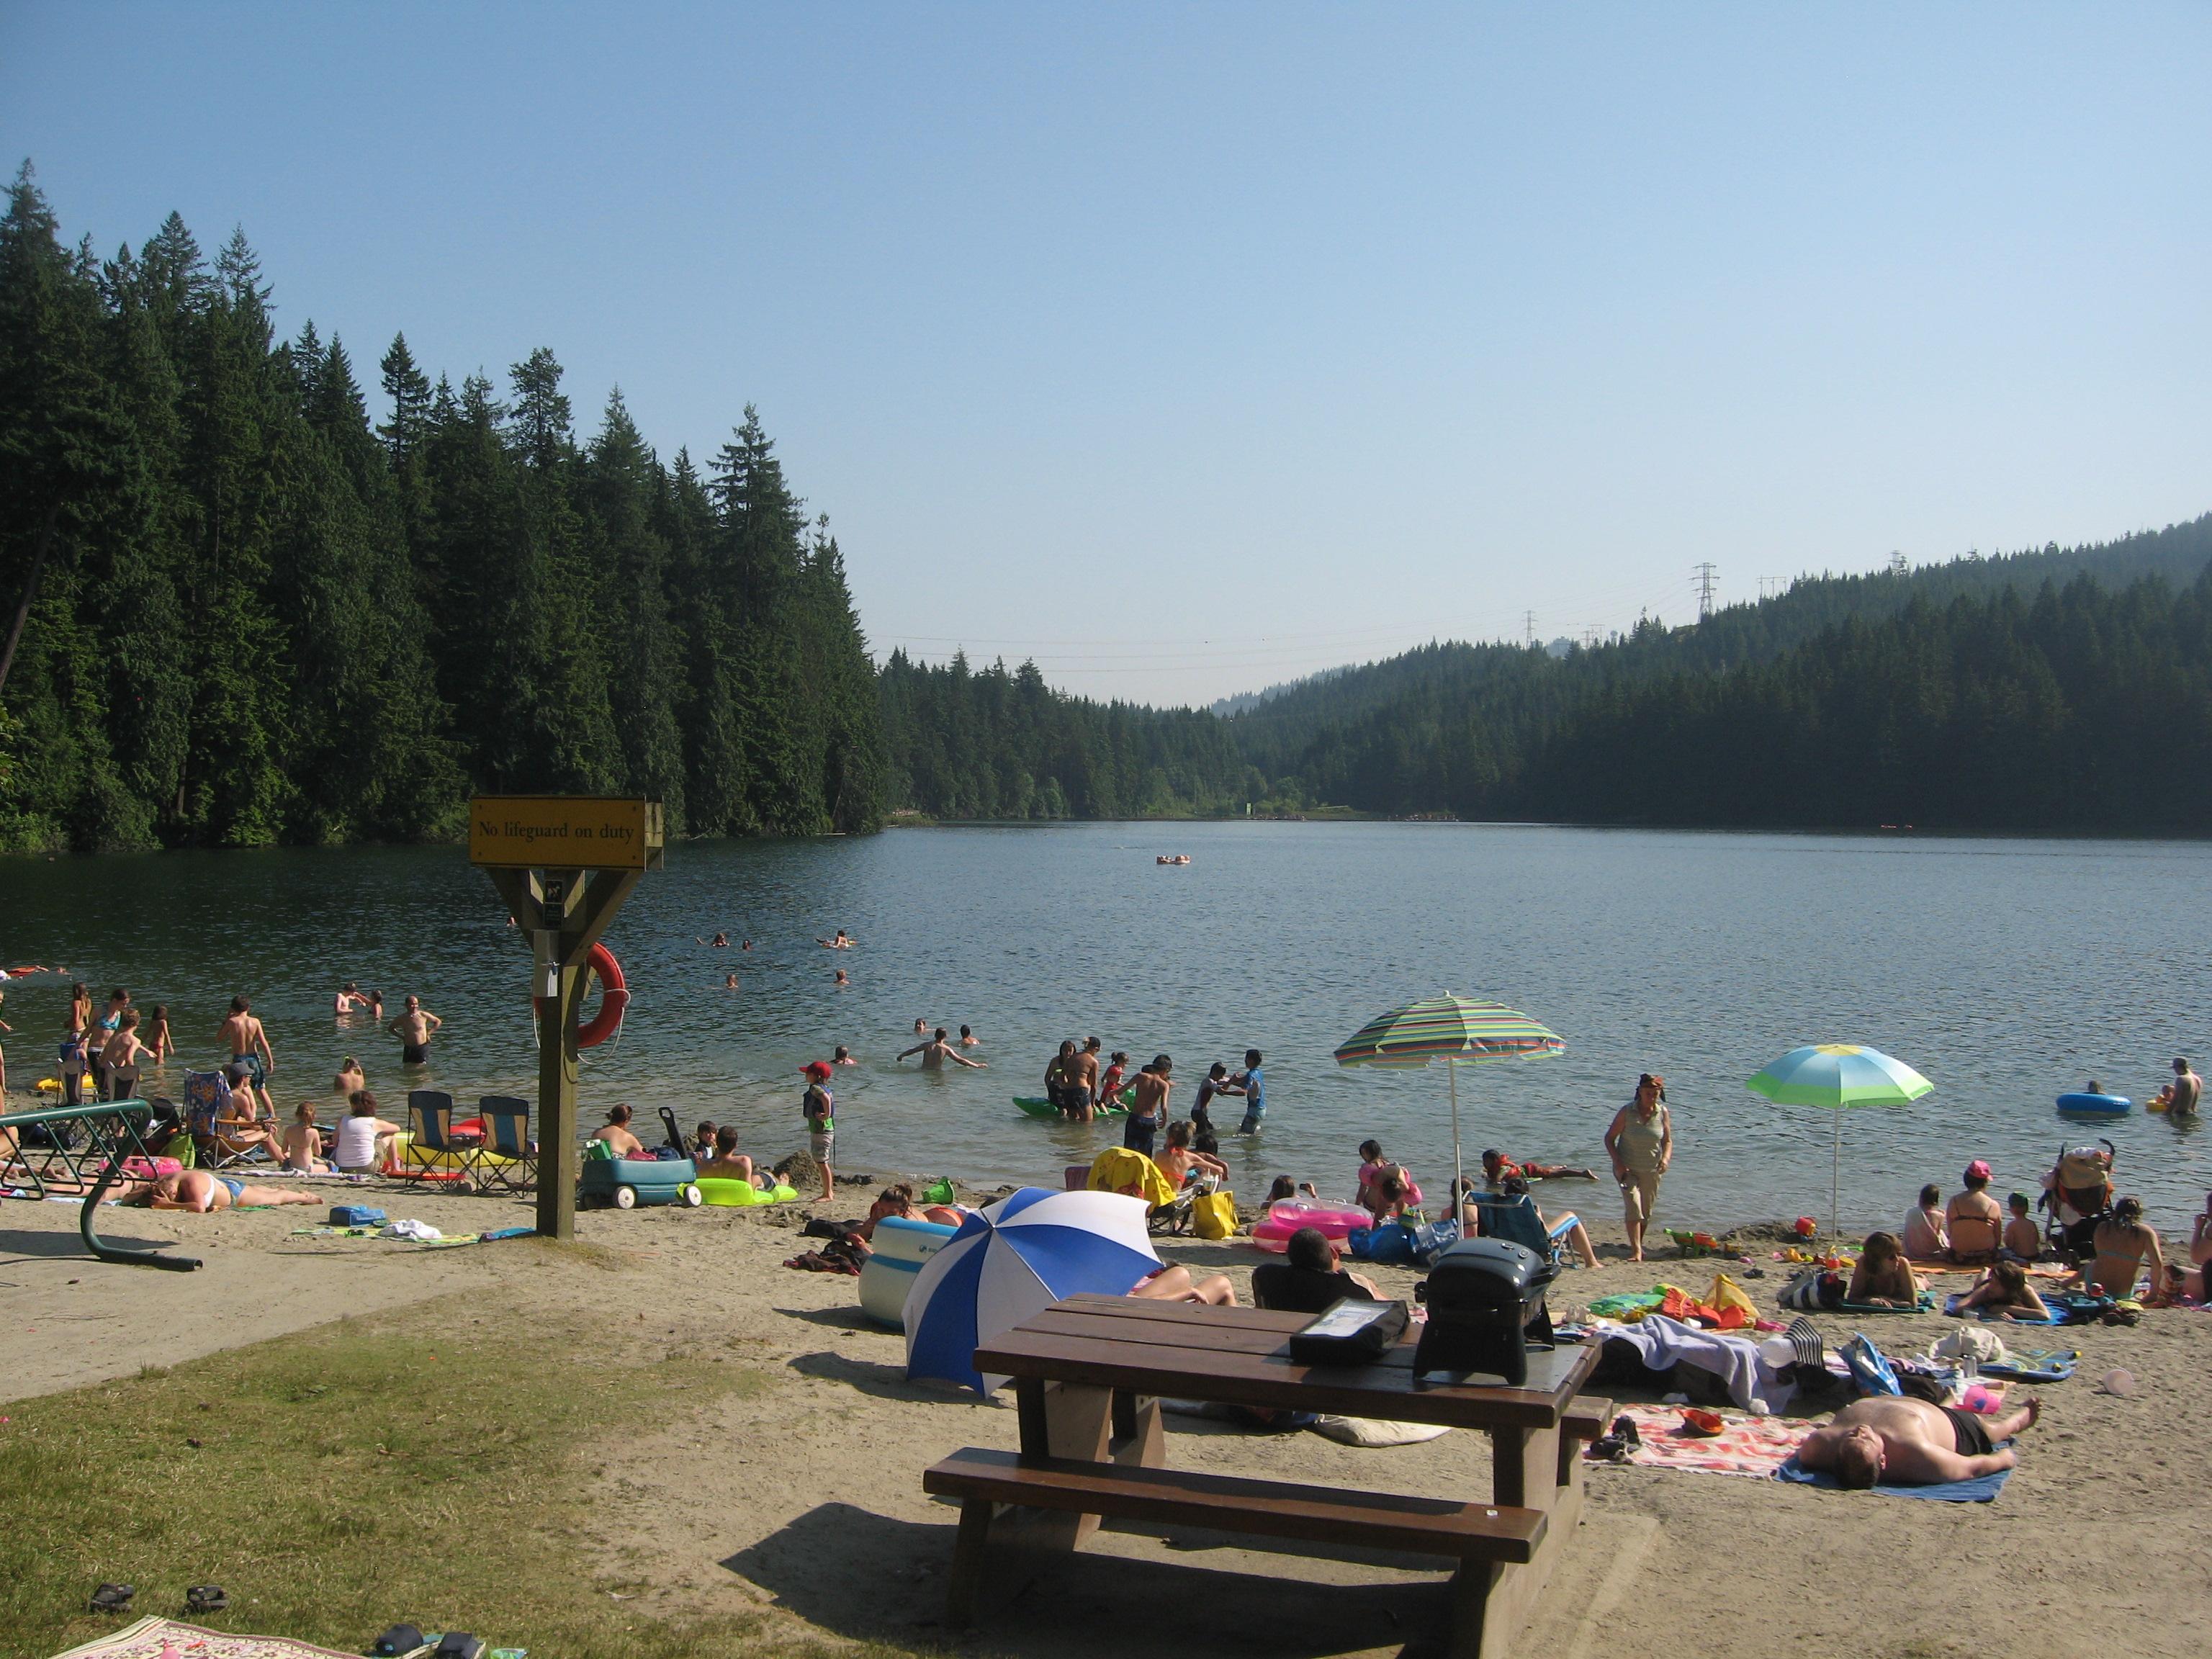 Swimming For Fun Or For Training At Sasamat Lake Olympic